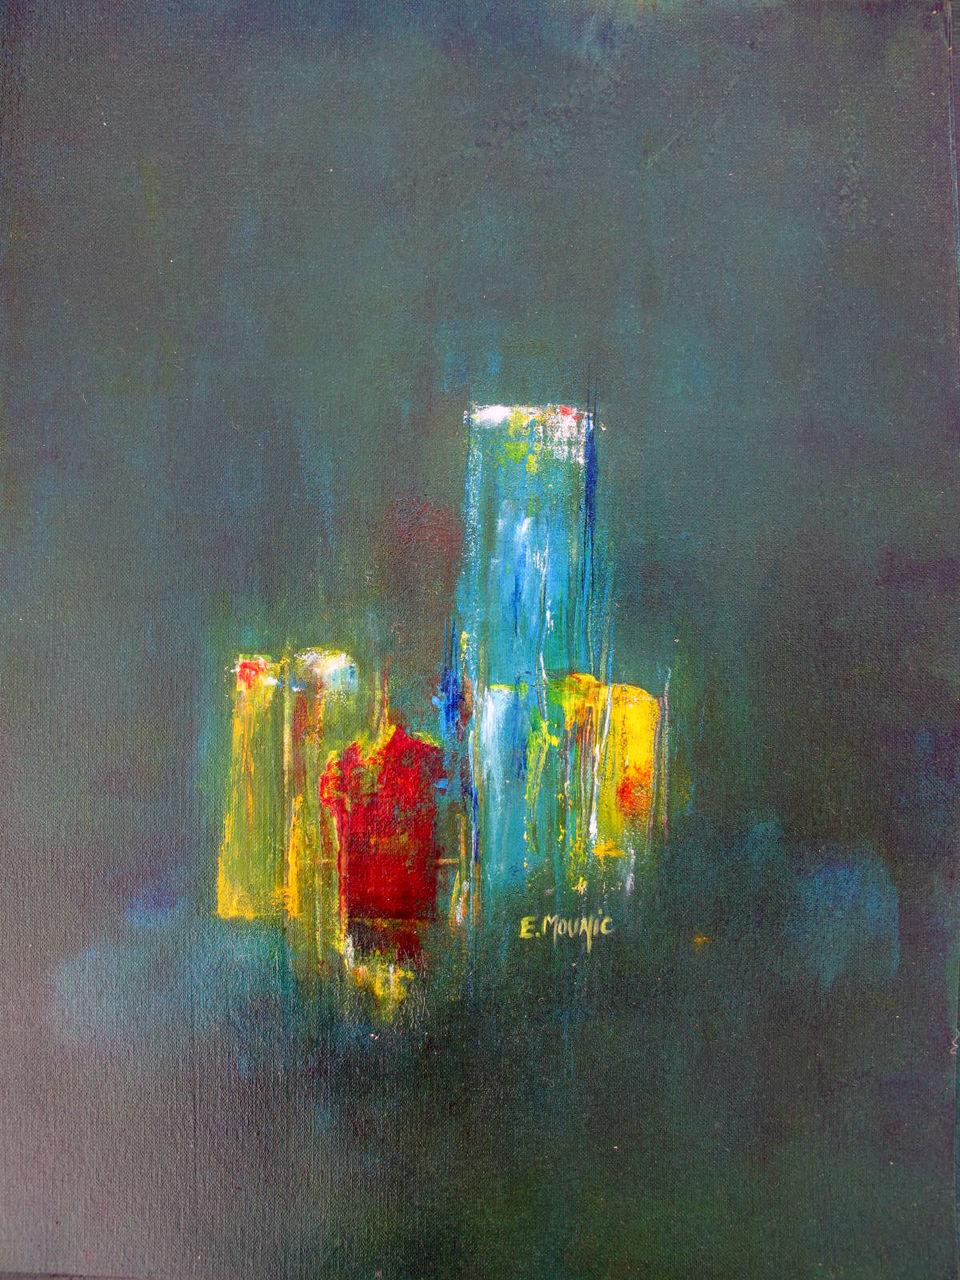 Elisabeth Mounic N 138 Variations